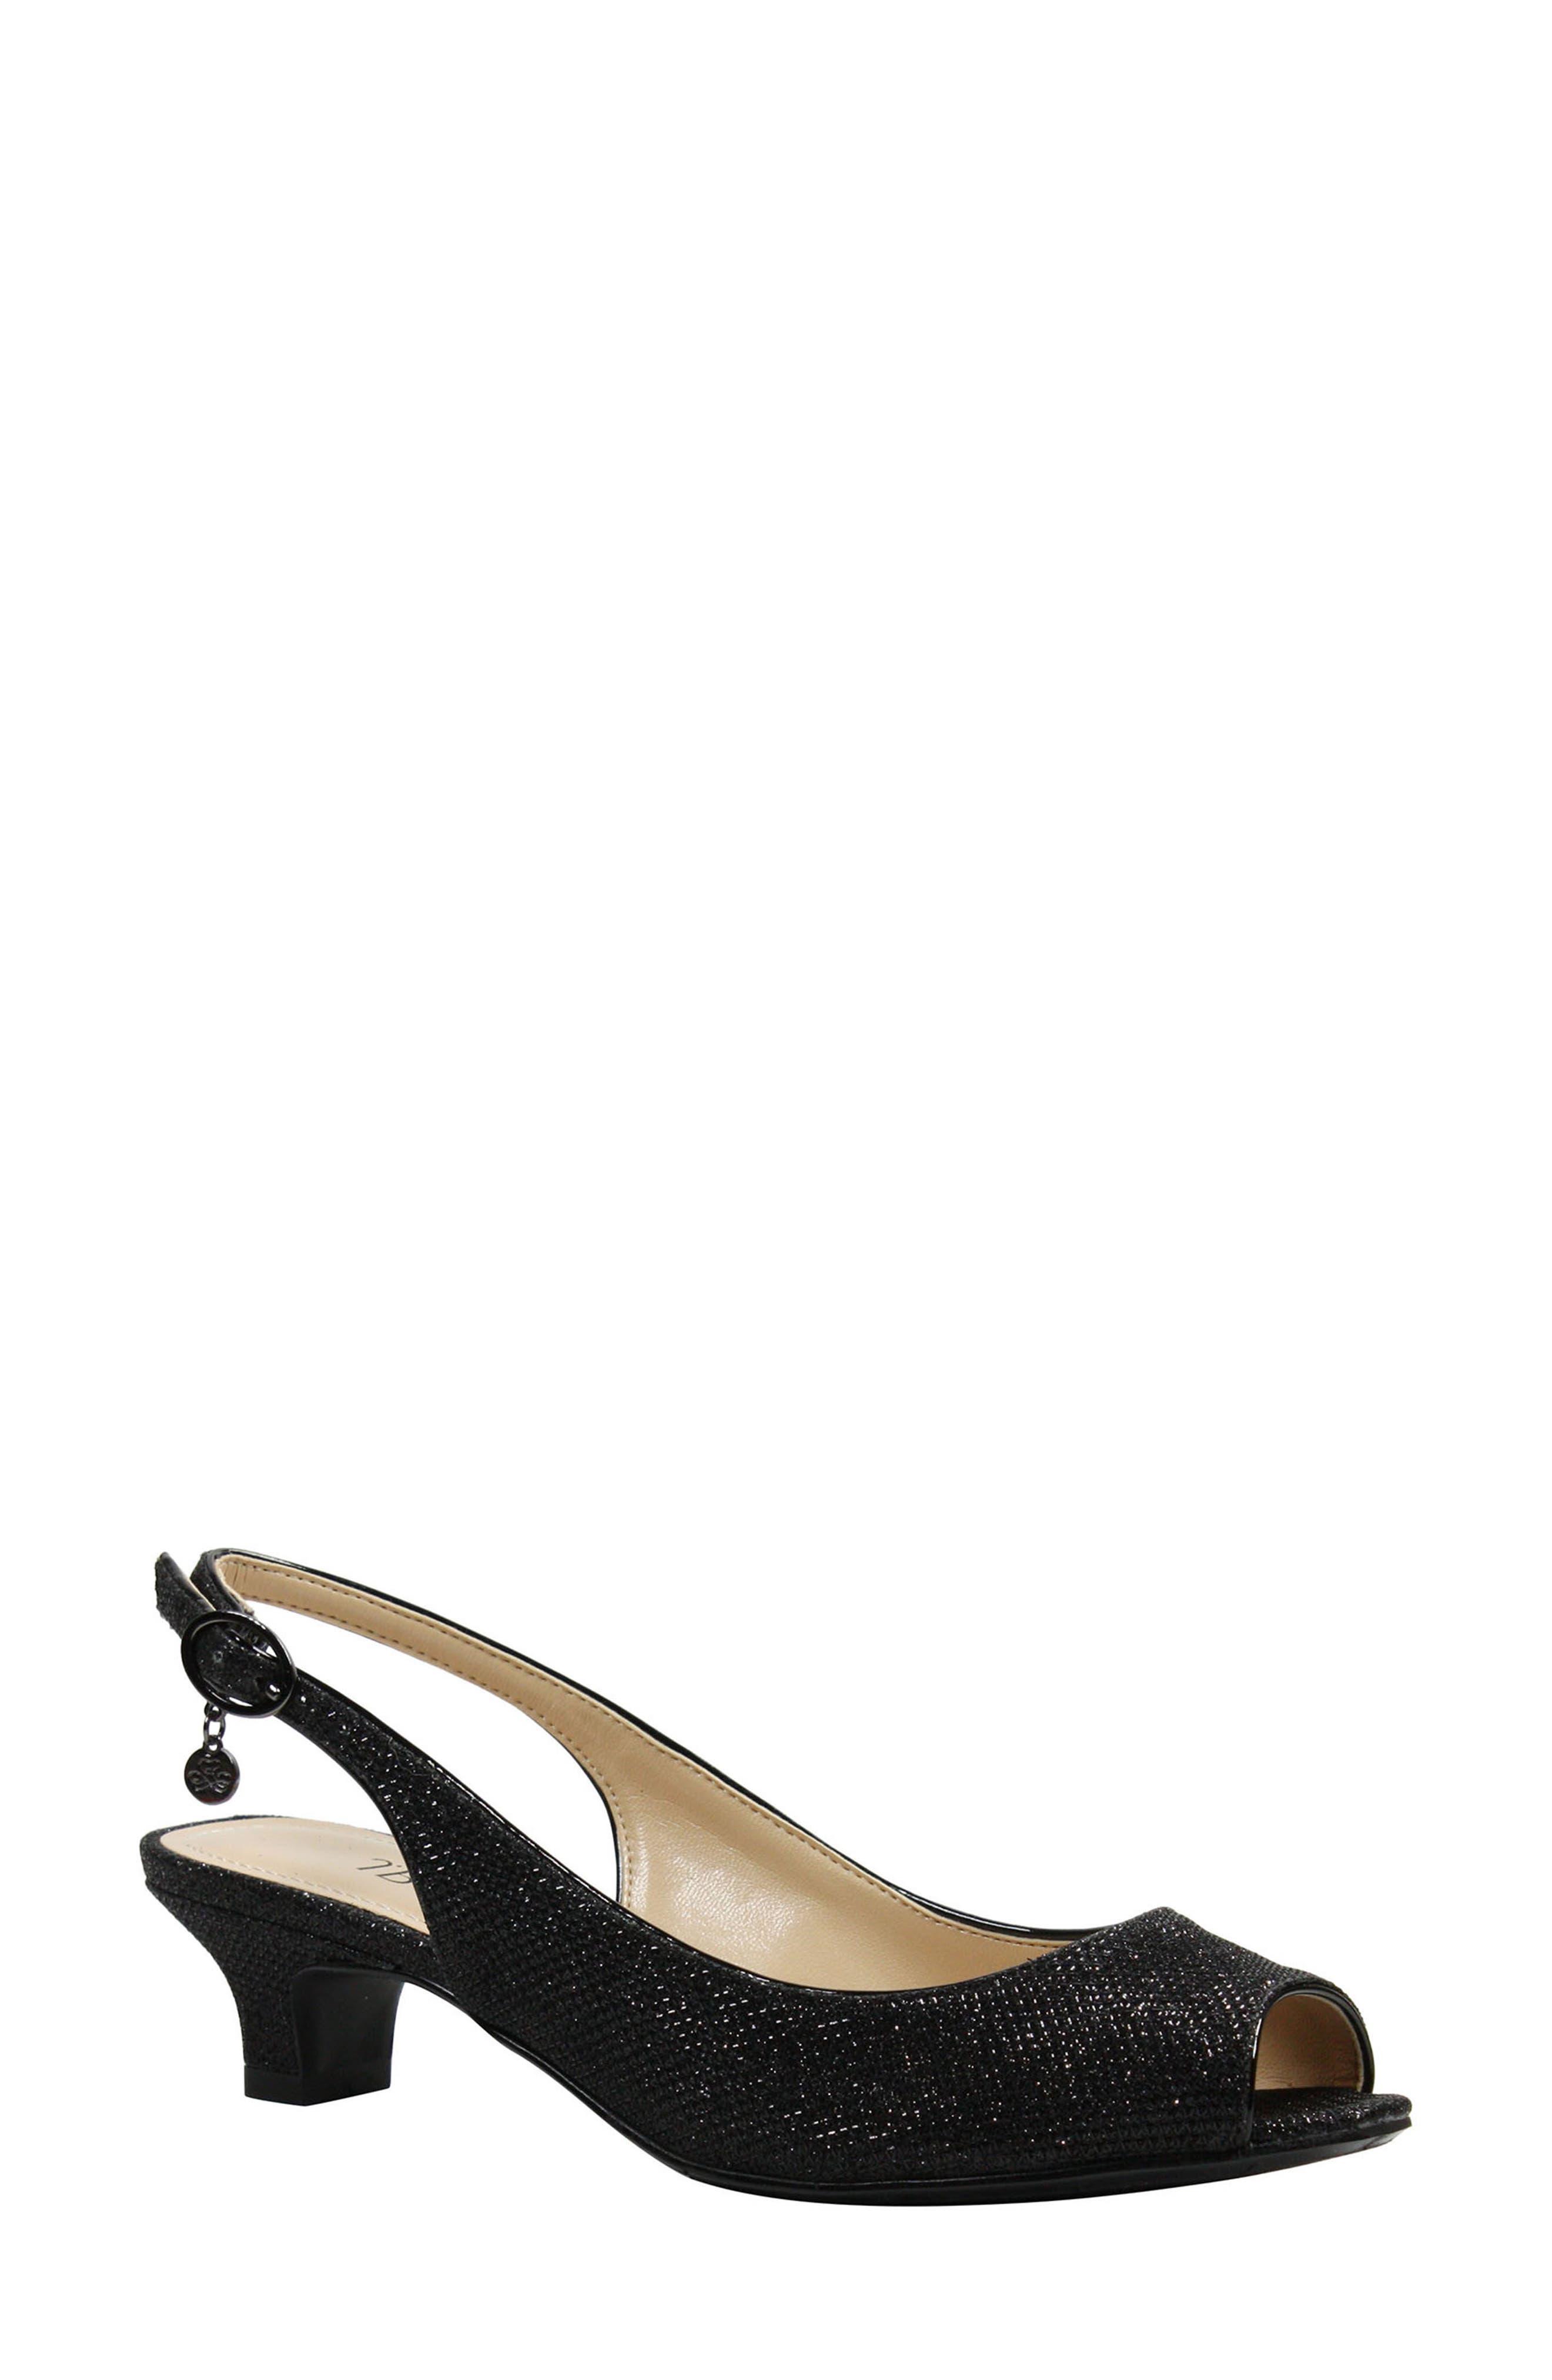 Jenvey Slingback Sandal,                         Main,                         color, Black Fabric